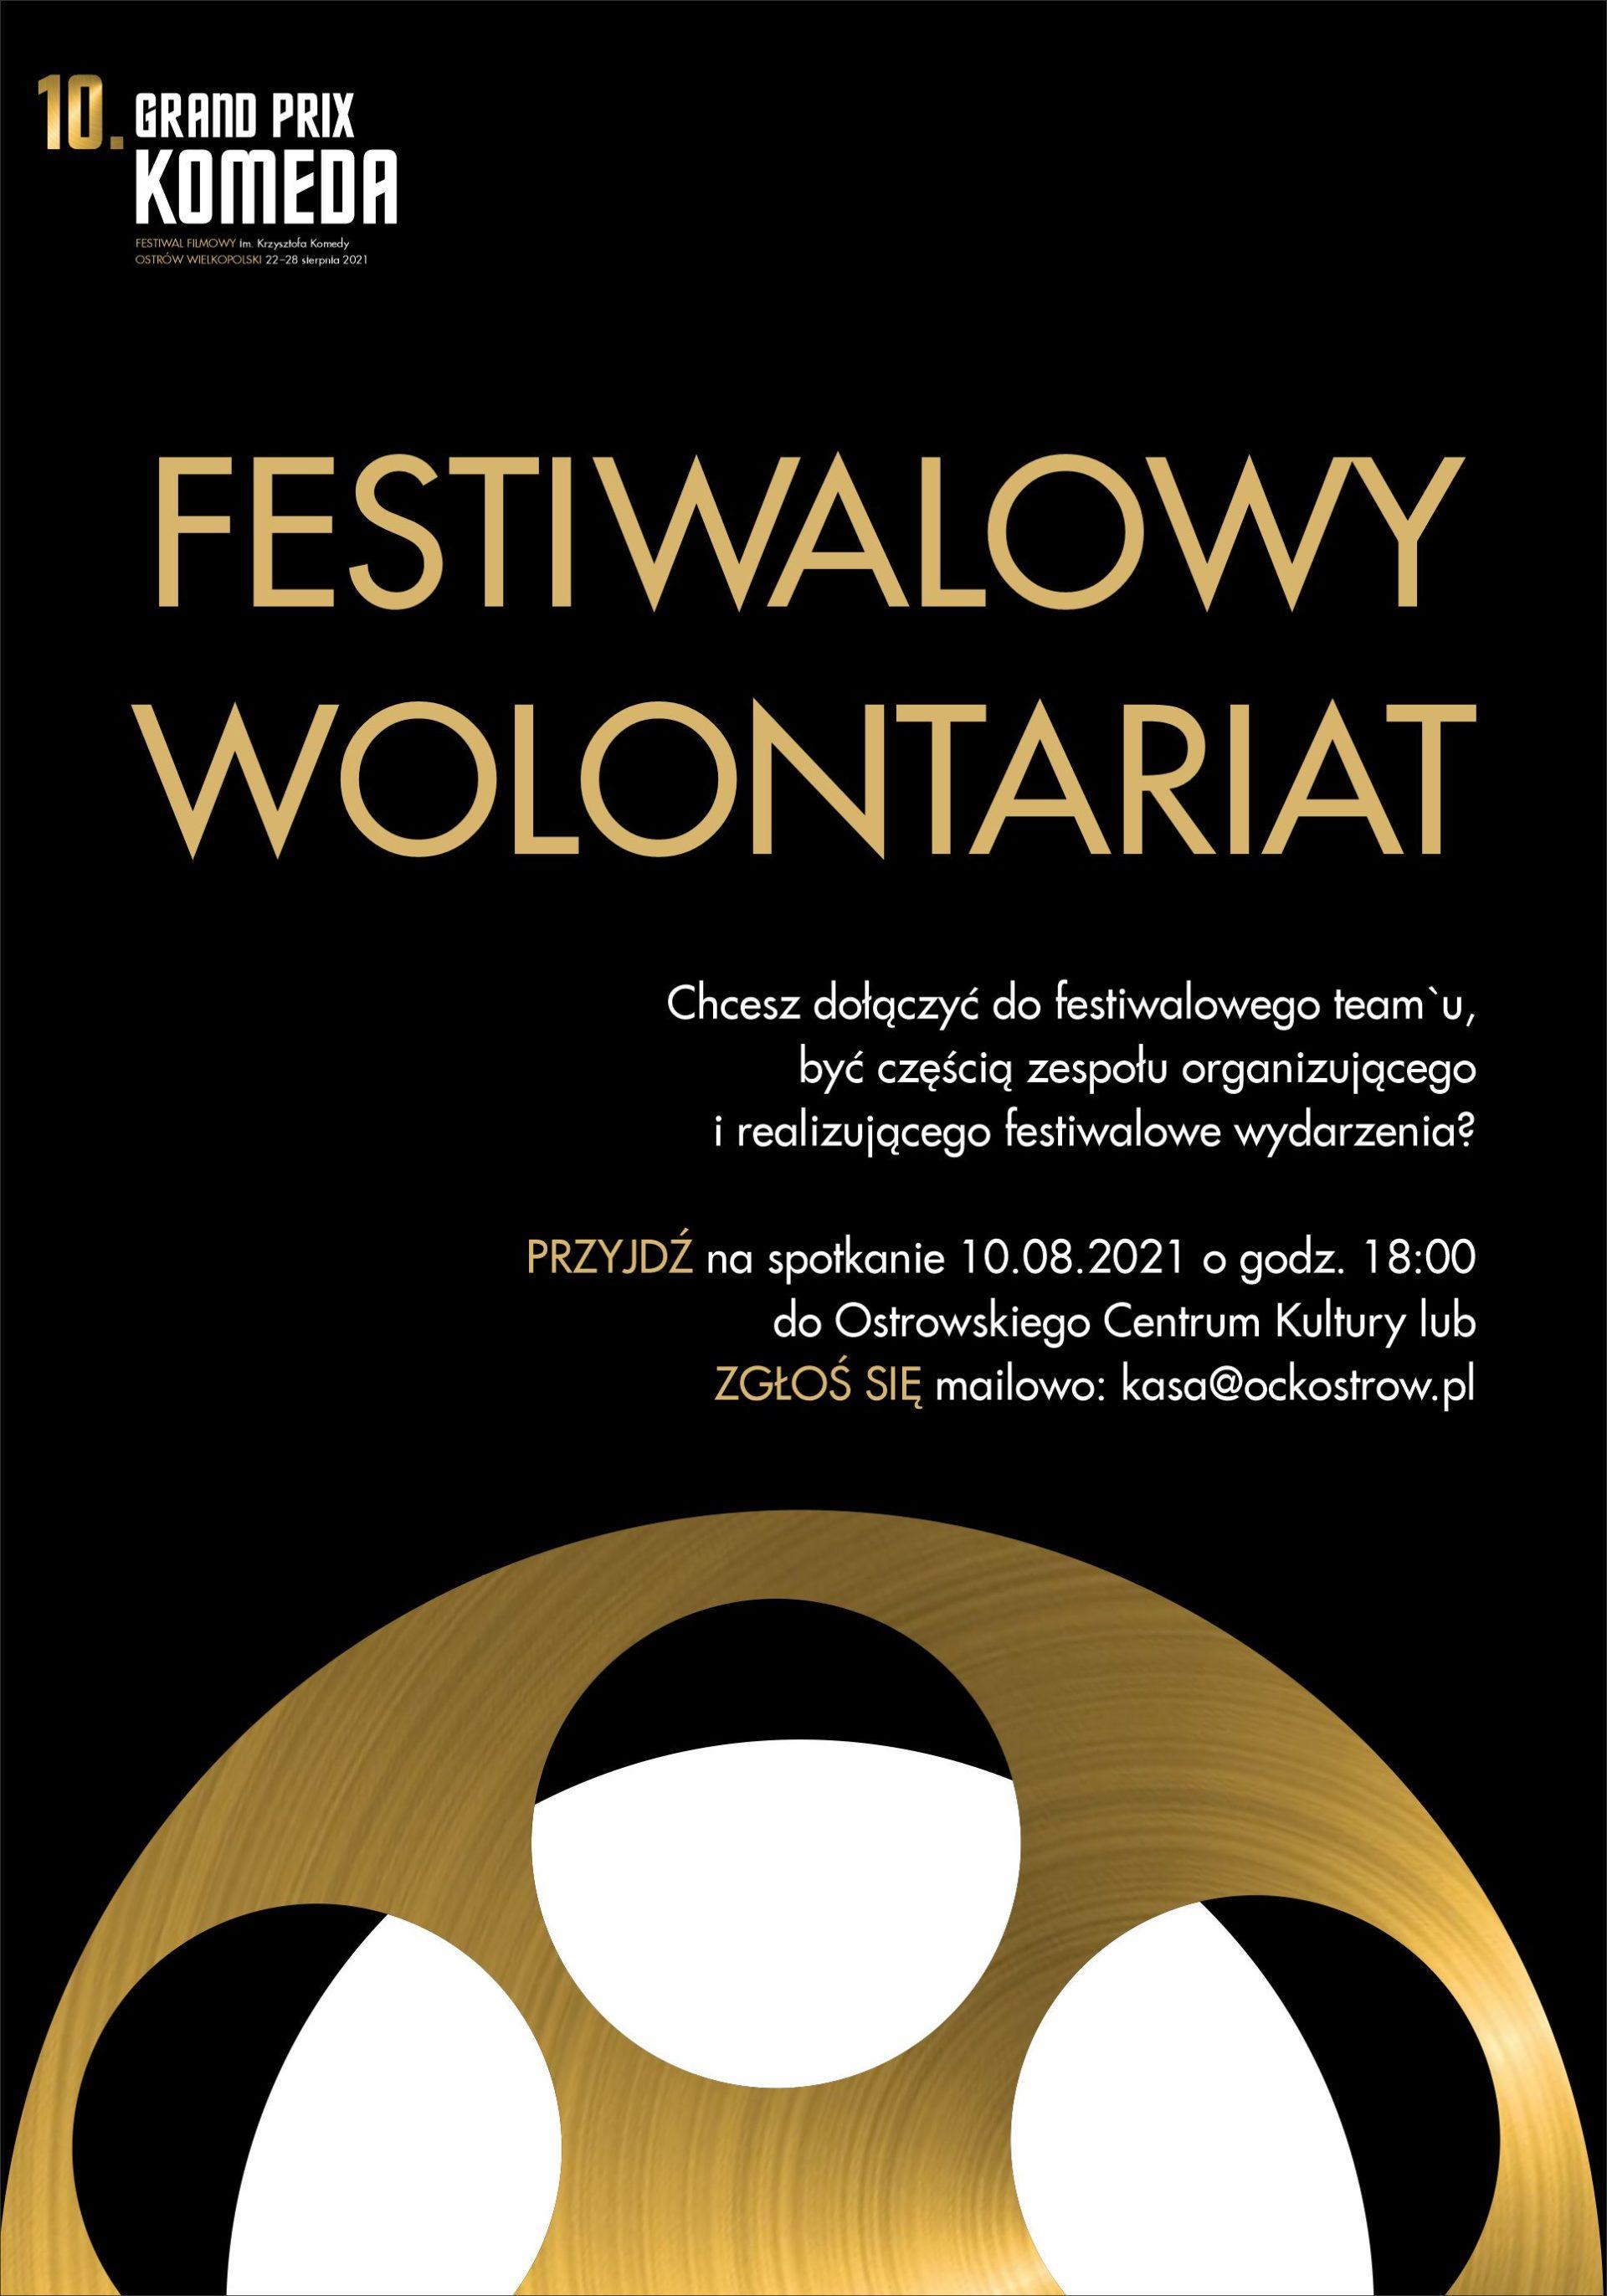 10. Grand Prix Komeda   Festiwalowy Wolontariat